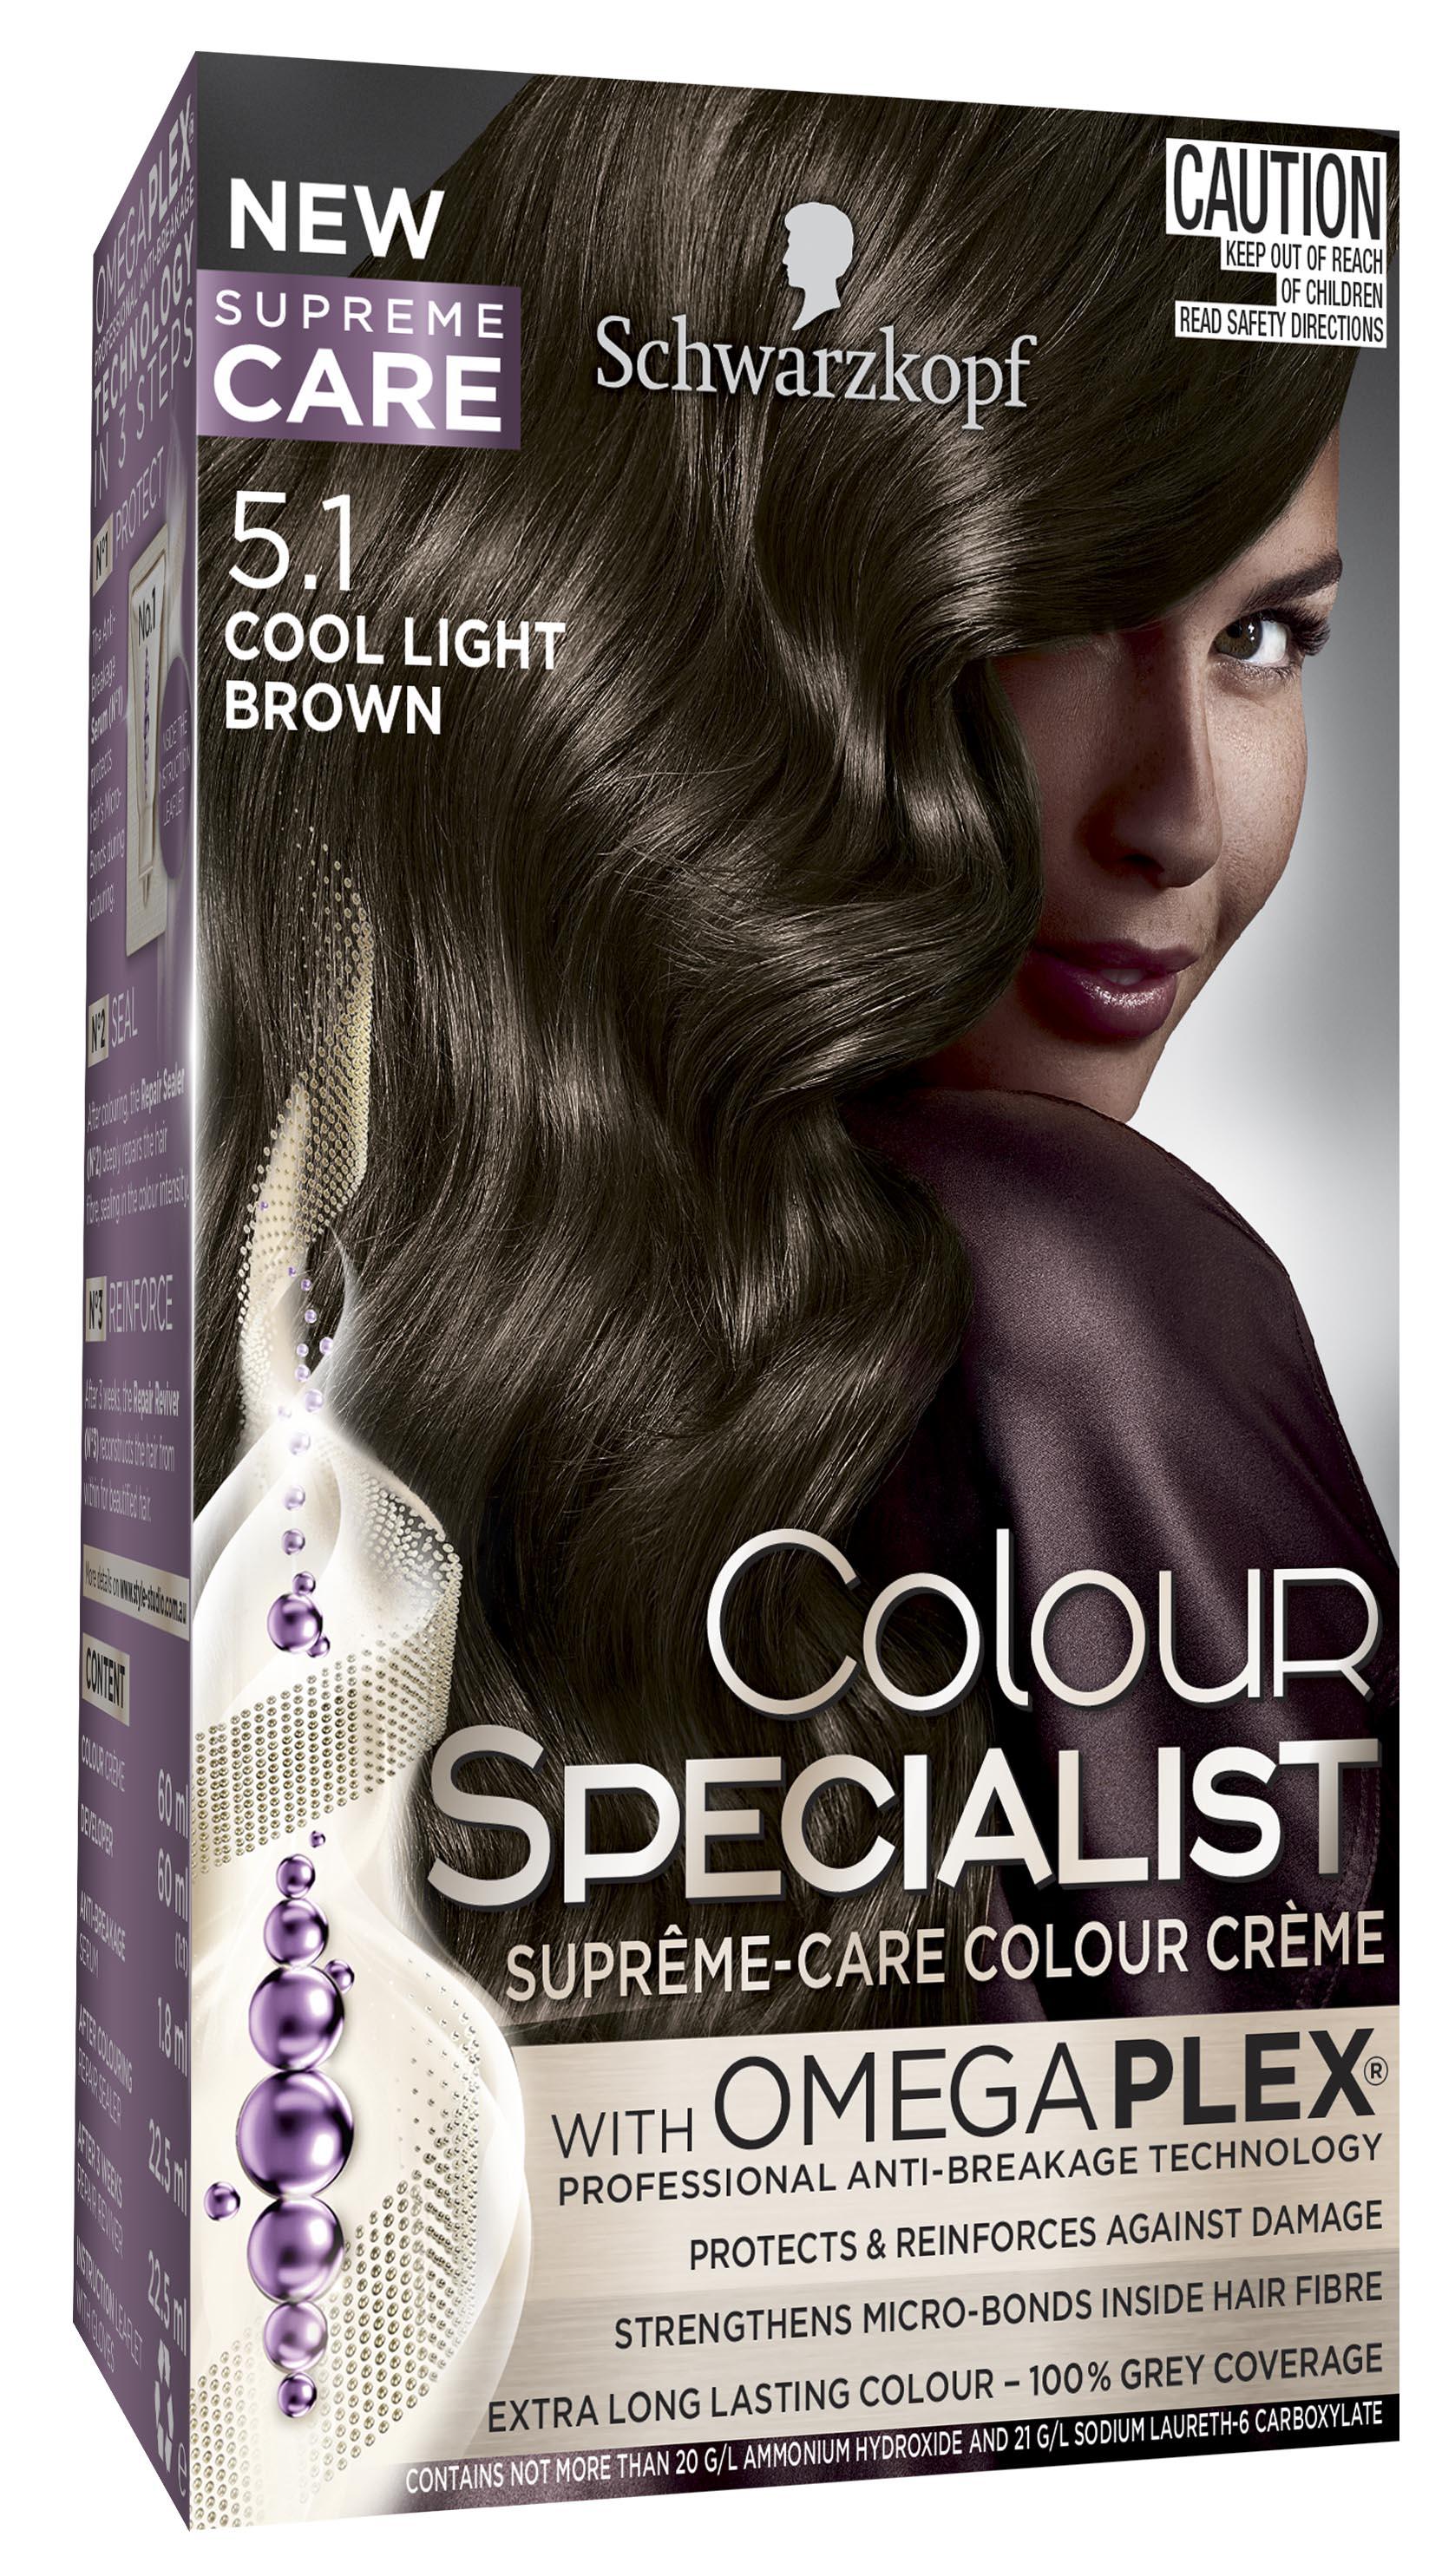 Colour Specialist 51 Cool Light Brown 3D LF-0040884